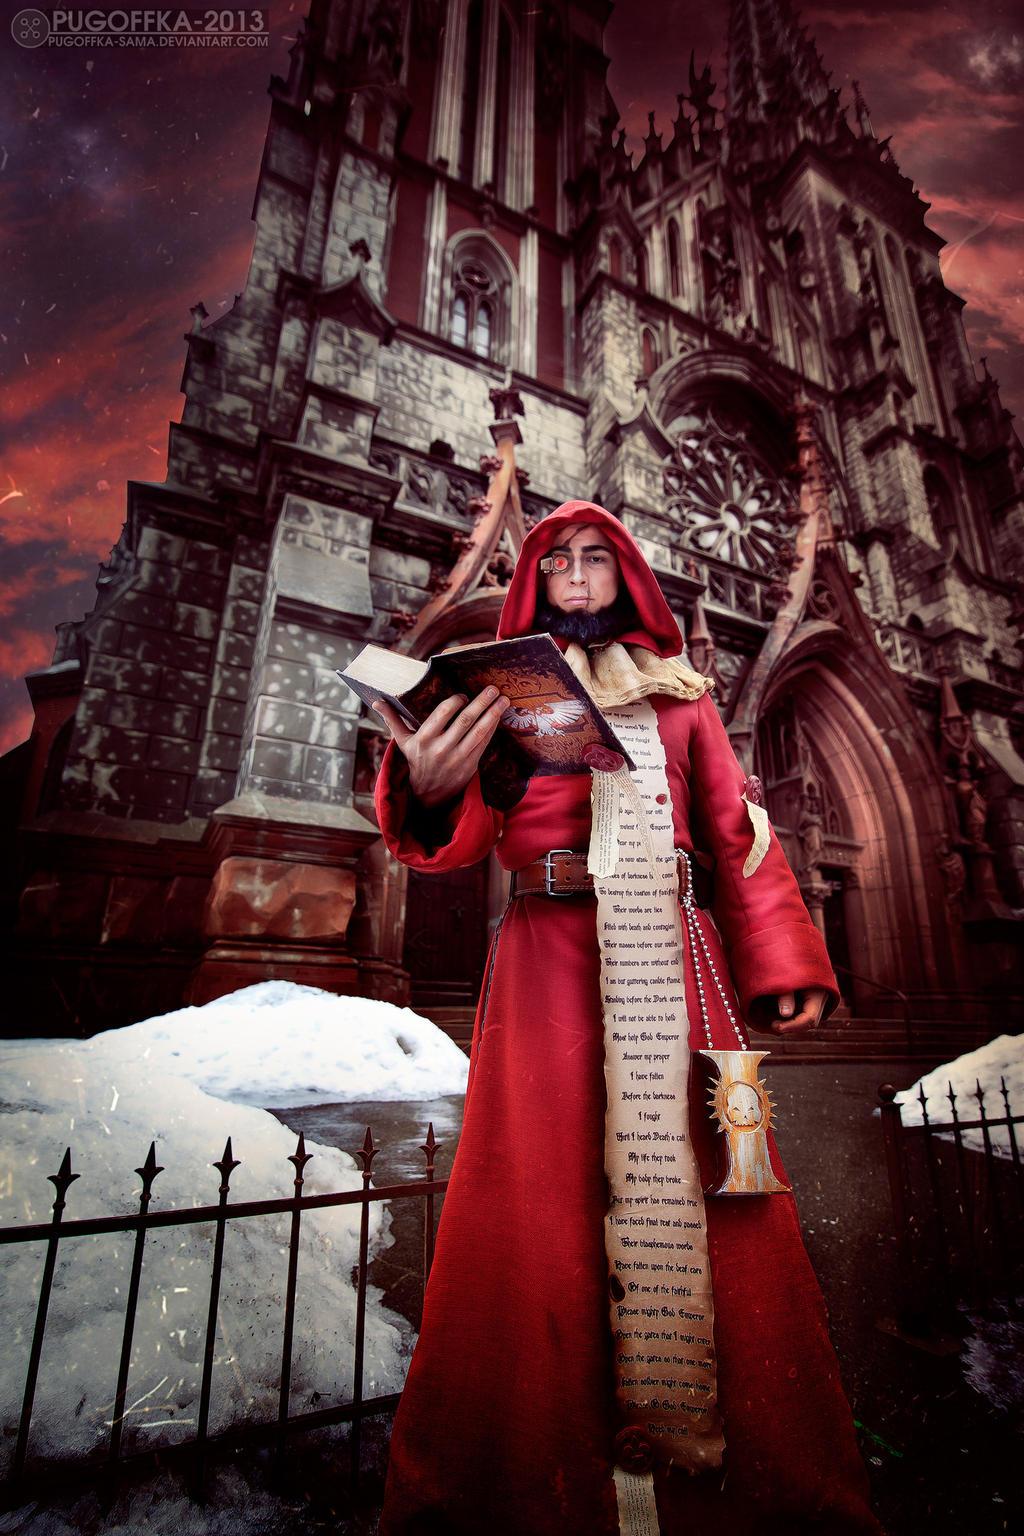 Warhammer 40K Ministorum Priest (Missionary) by Pugoffka-sama